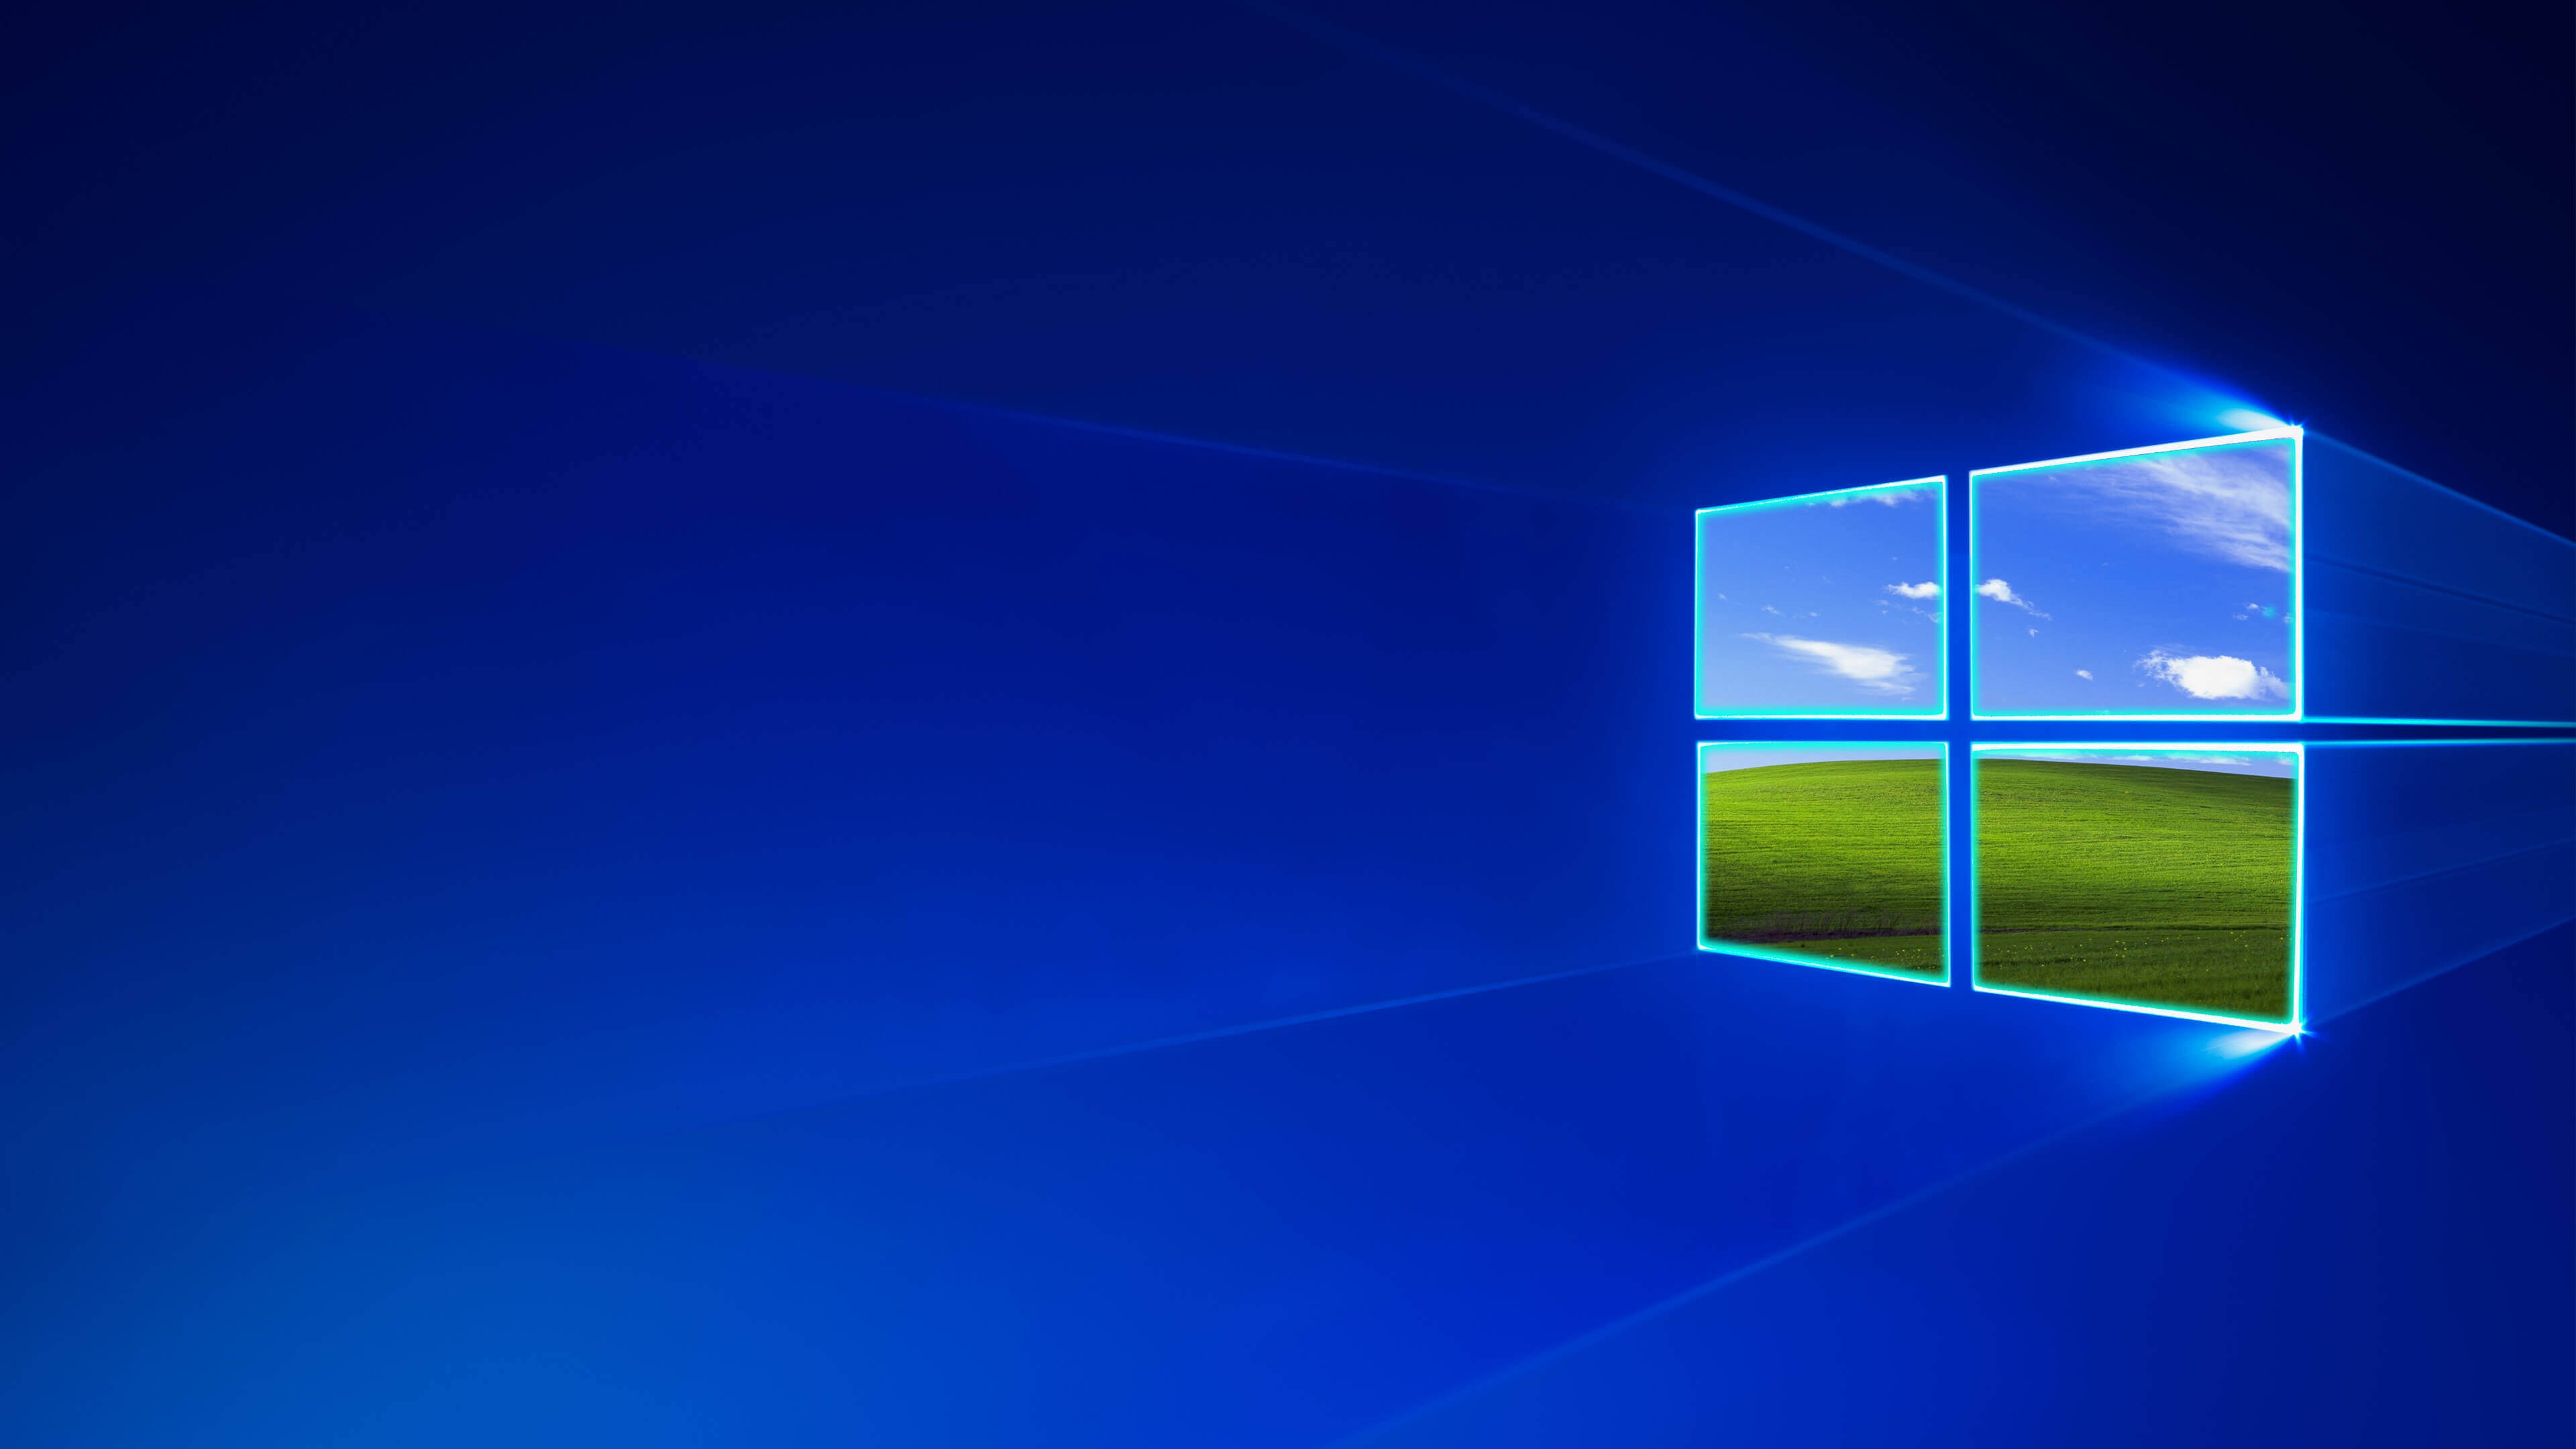 Windows 10 Bliss free wallpaper